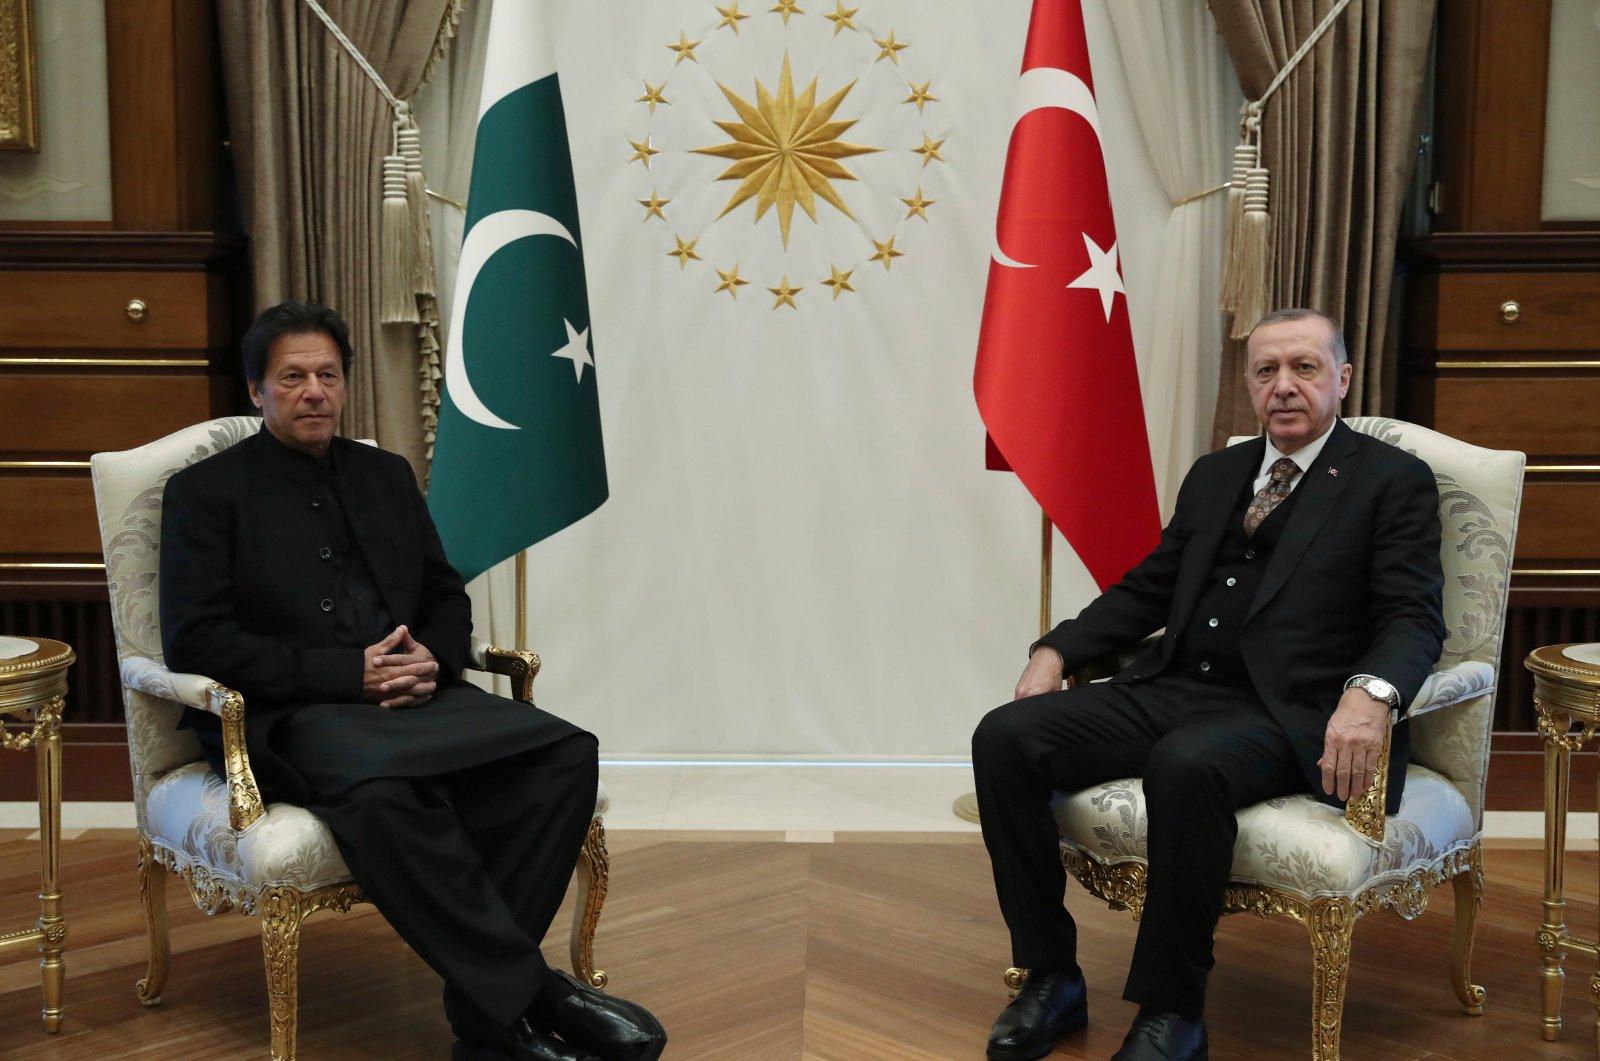 Pakistan's Prime Minister Imran Khan (L) and President Recep Tayyip Erdoğan pose for the media before a meeting, Ankara, Jan. 4, 2019. (AP Photo)